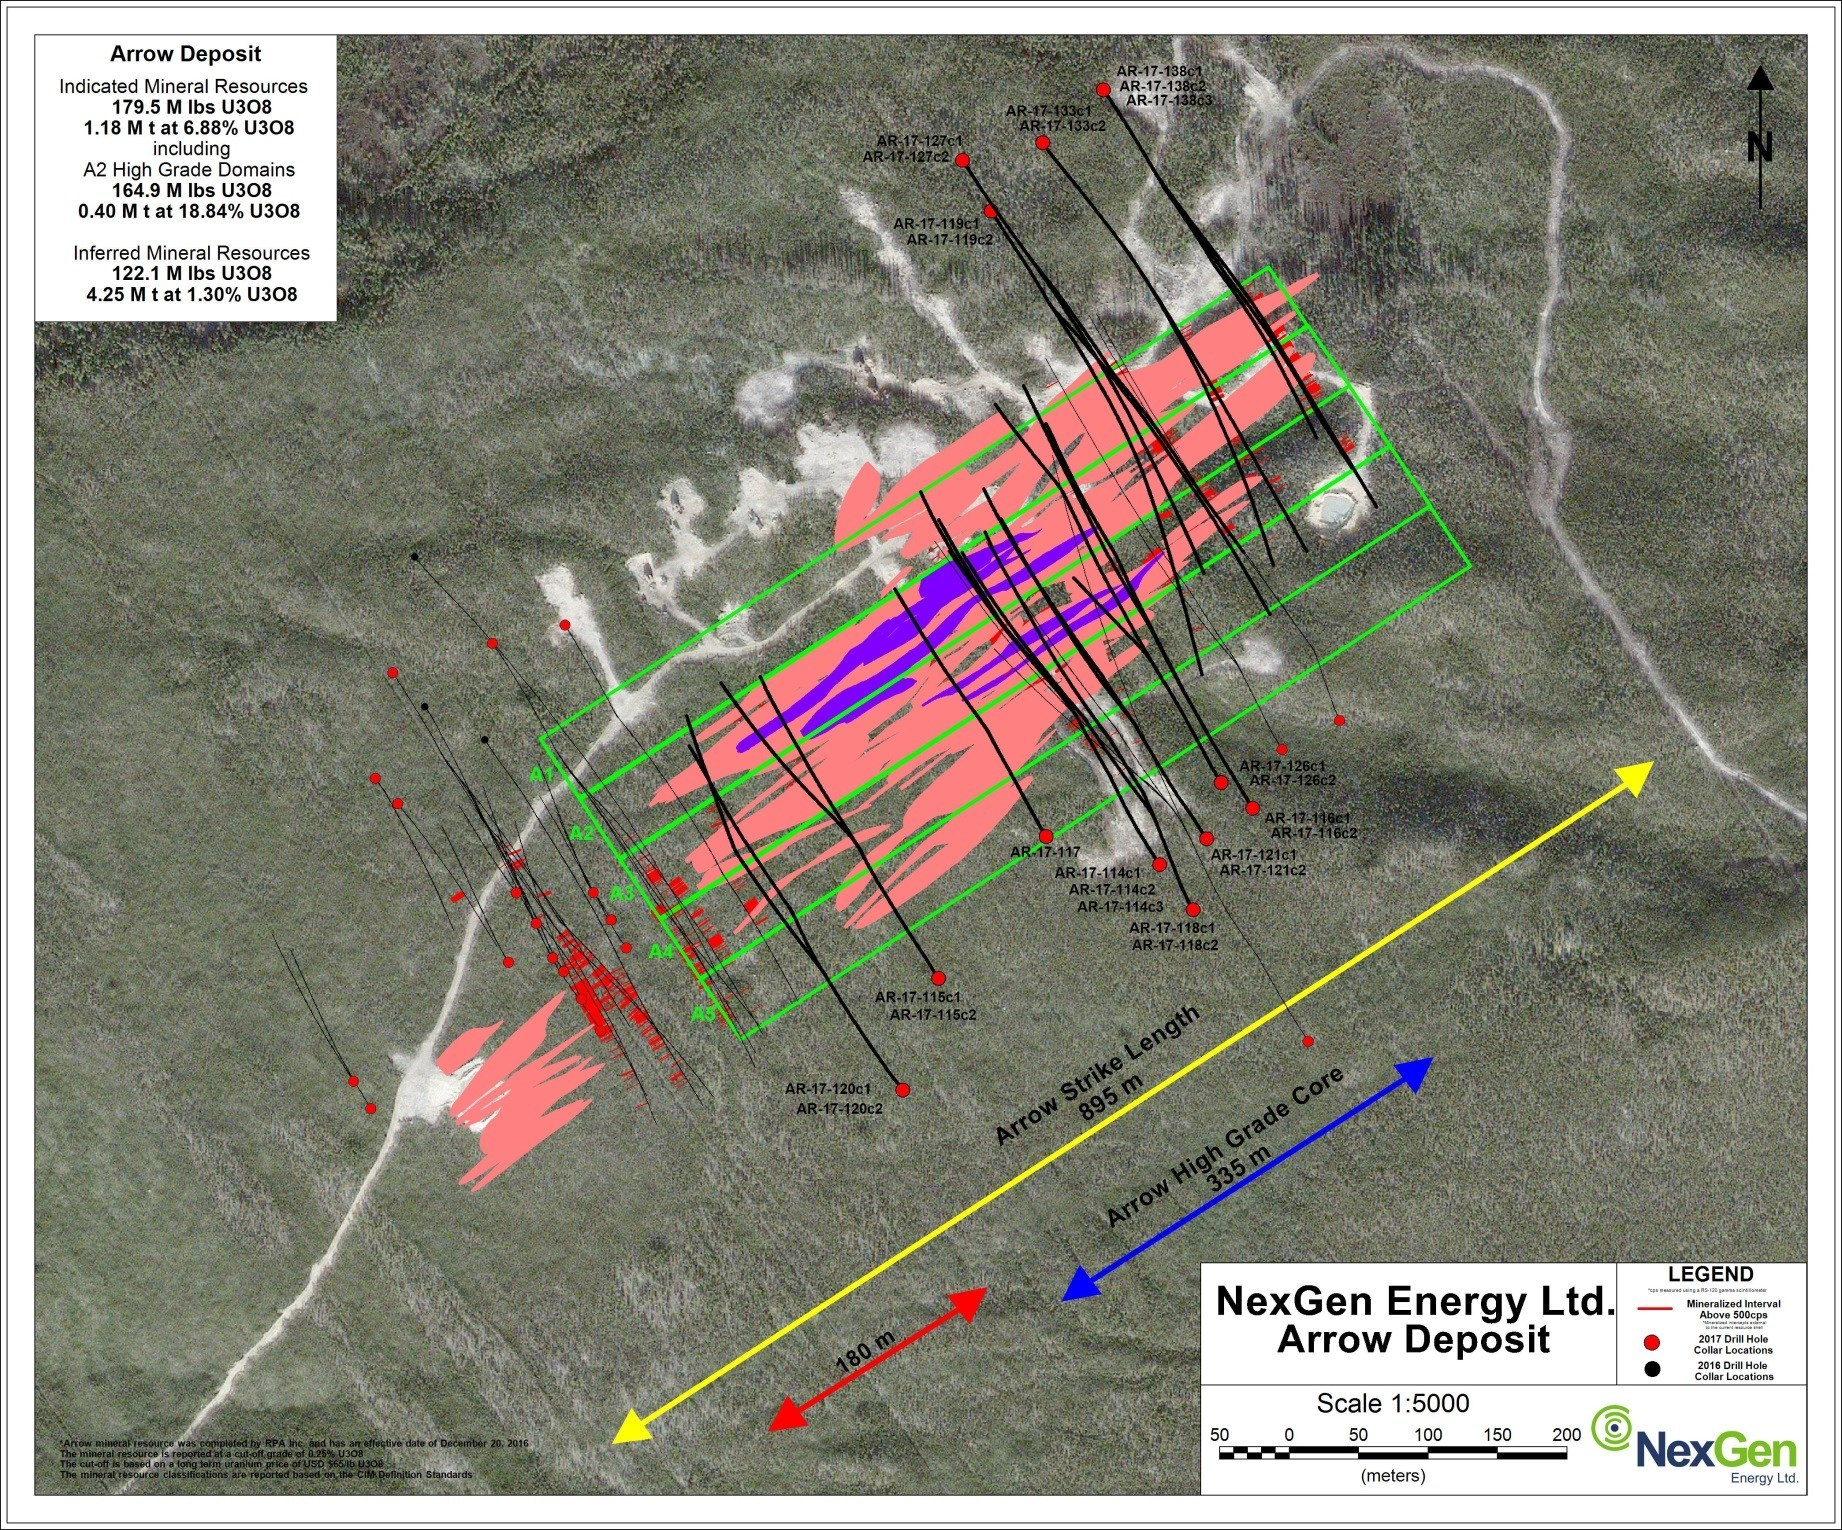 Figure 4: Drill Hole Locations (CNW Group/NexGen Energy Ltd.)